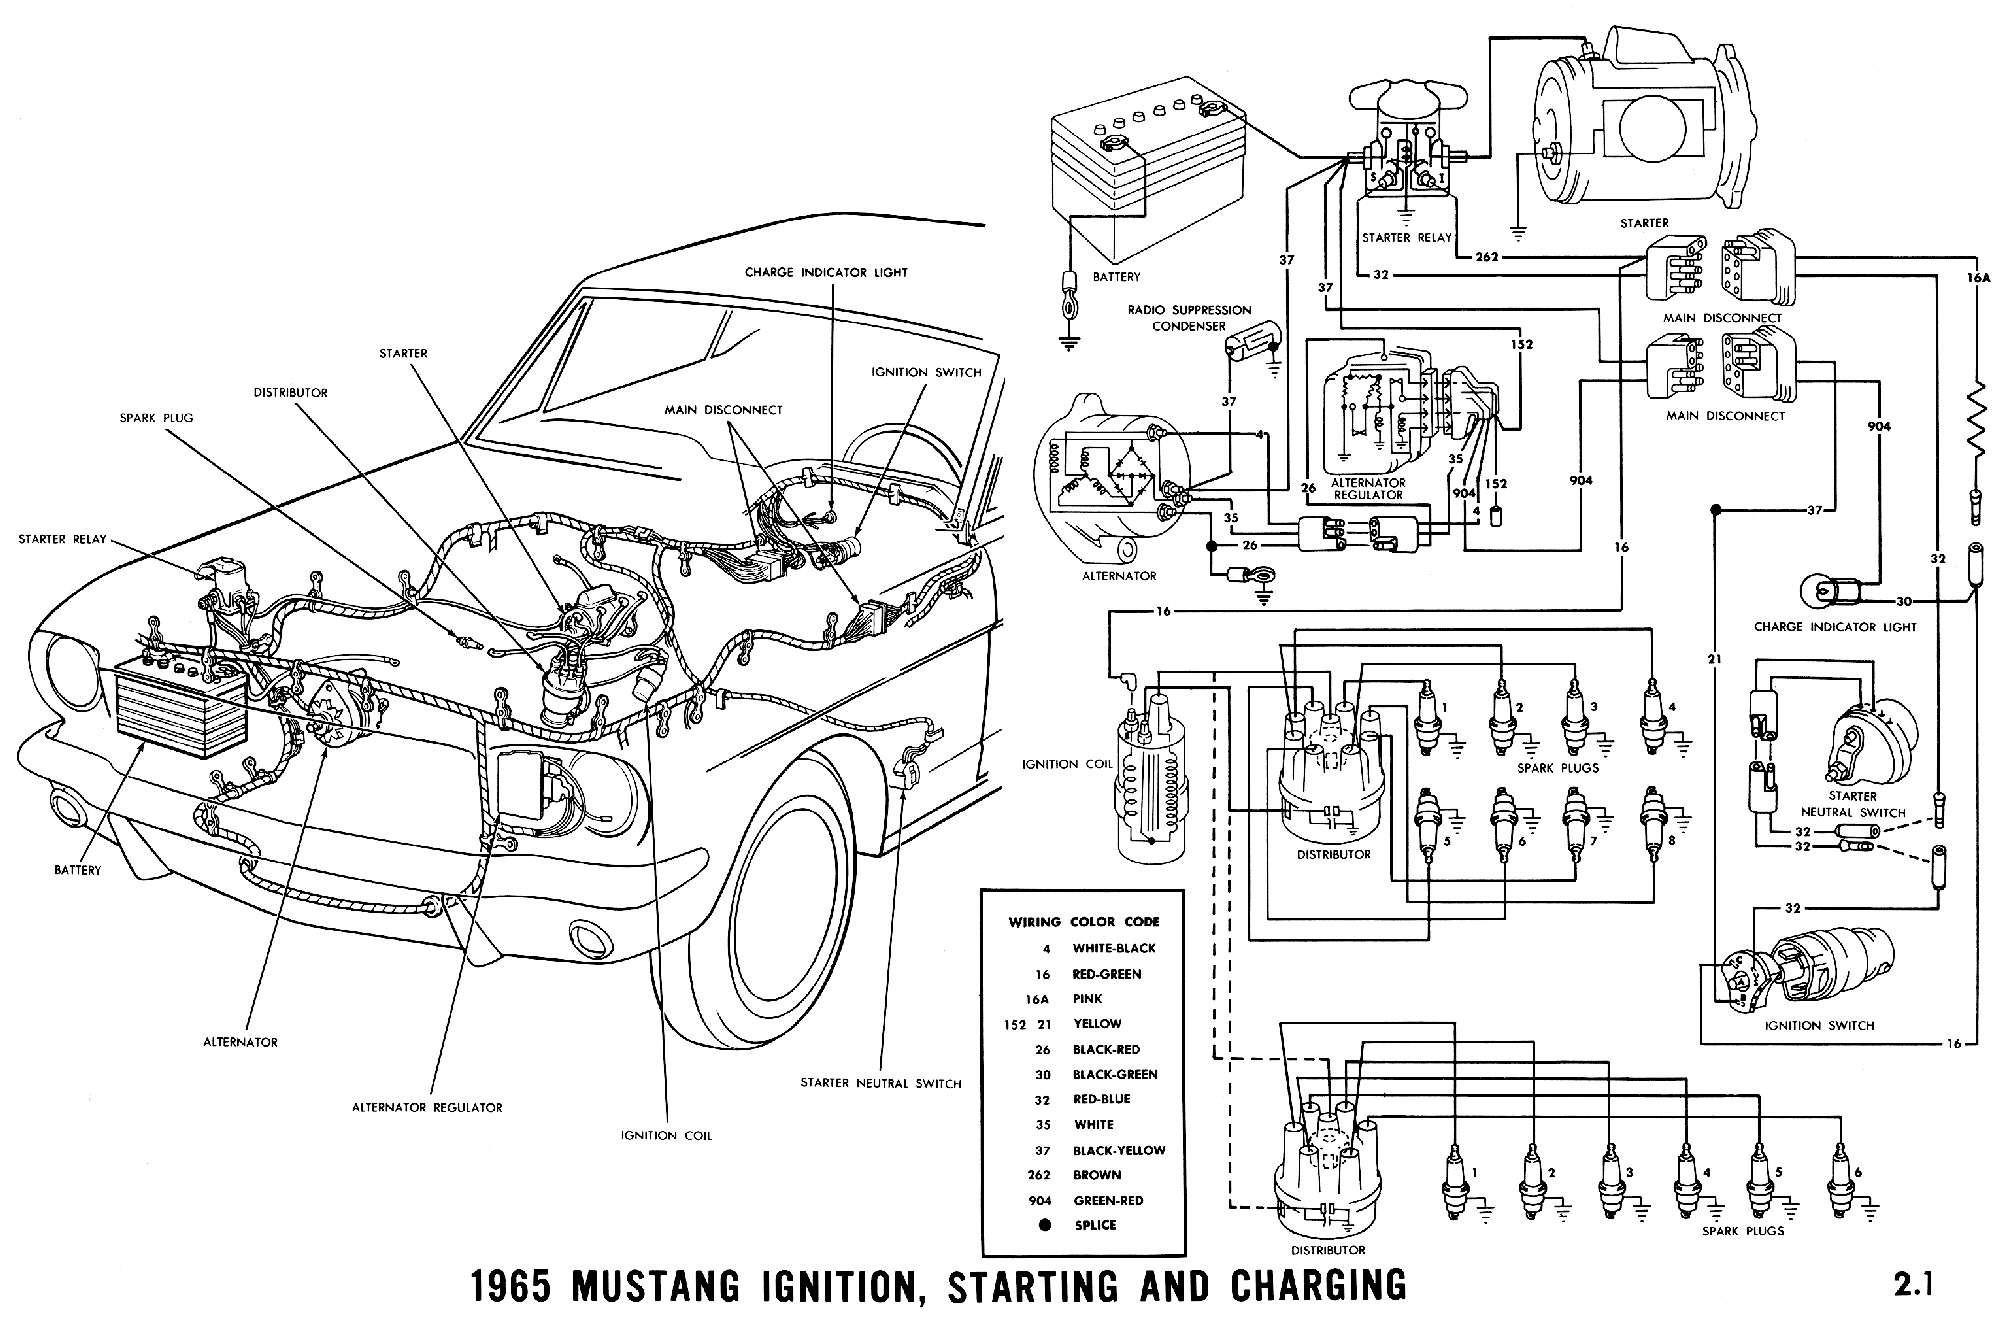 Car Parts Labeled Diagram | My Wiring DIagram